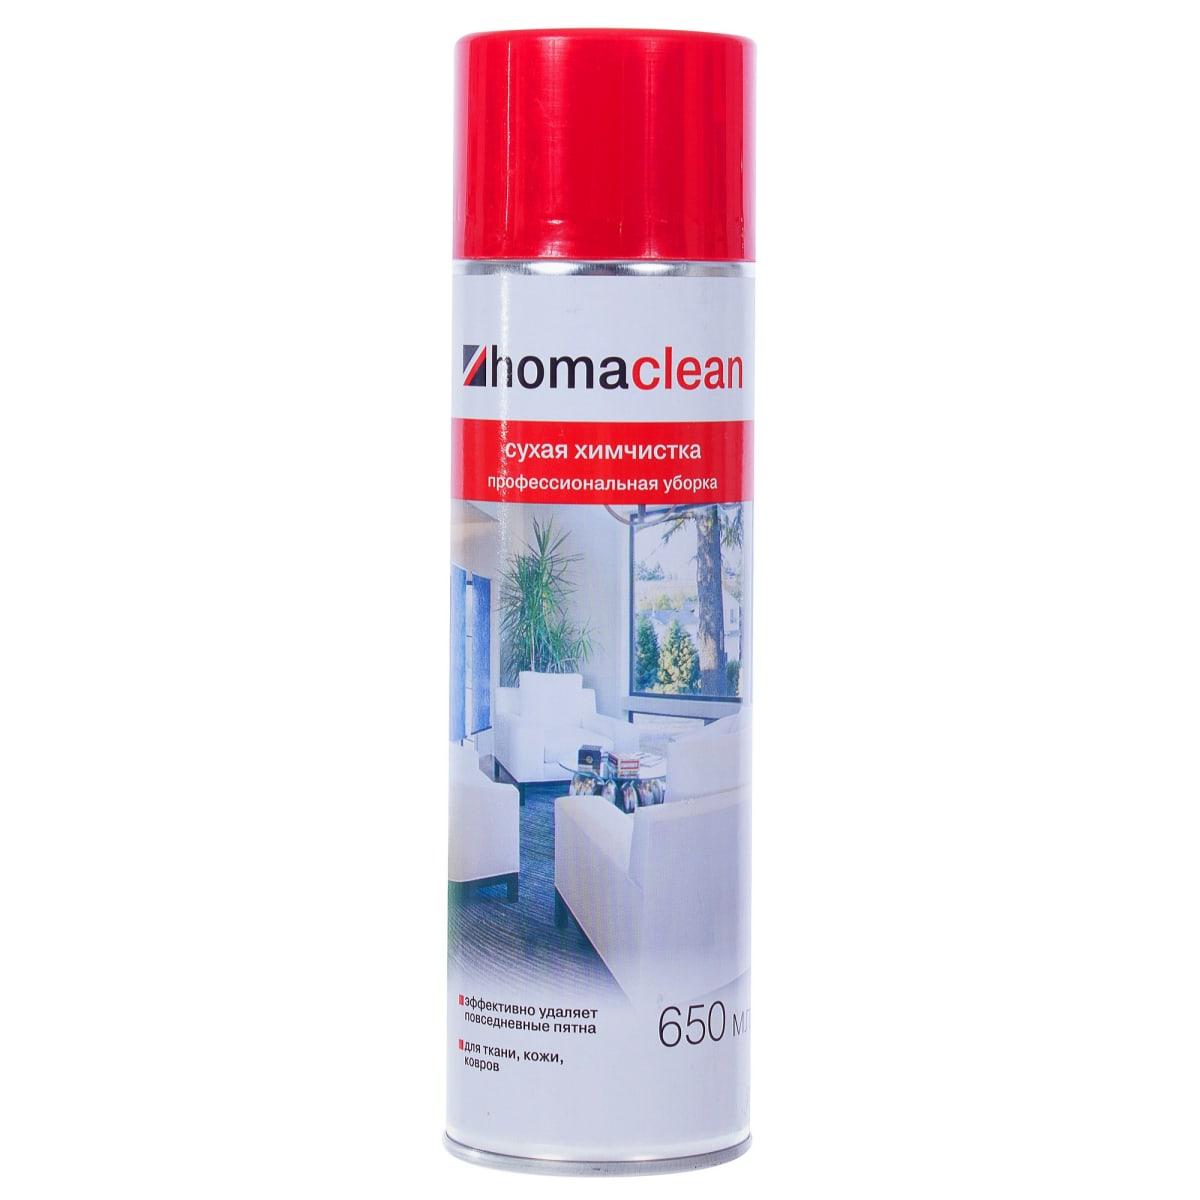 Пена для сухой химчистки Homaclean 0.65 л